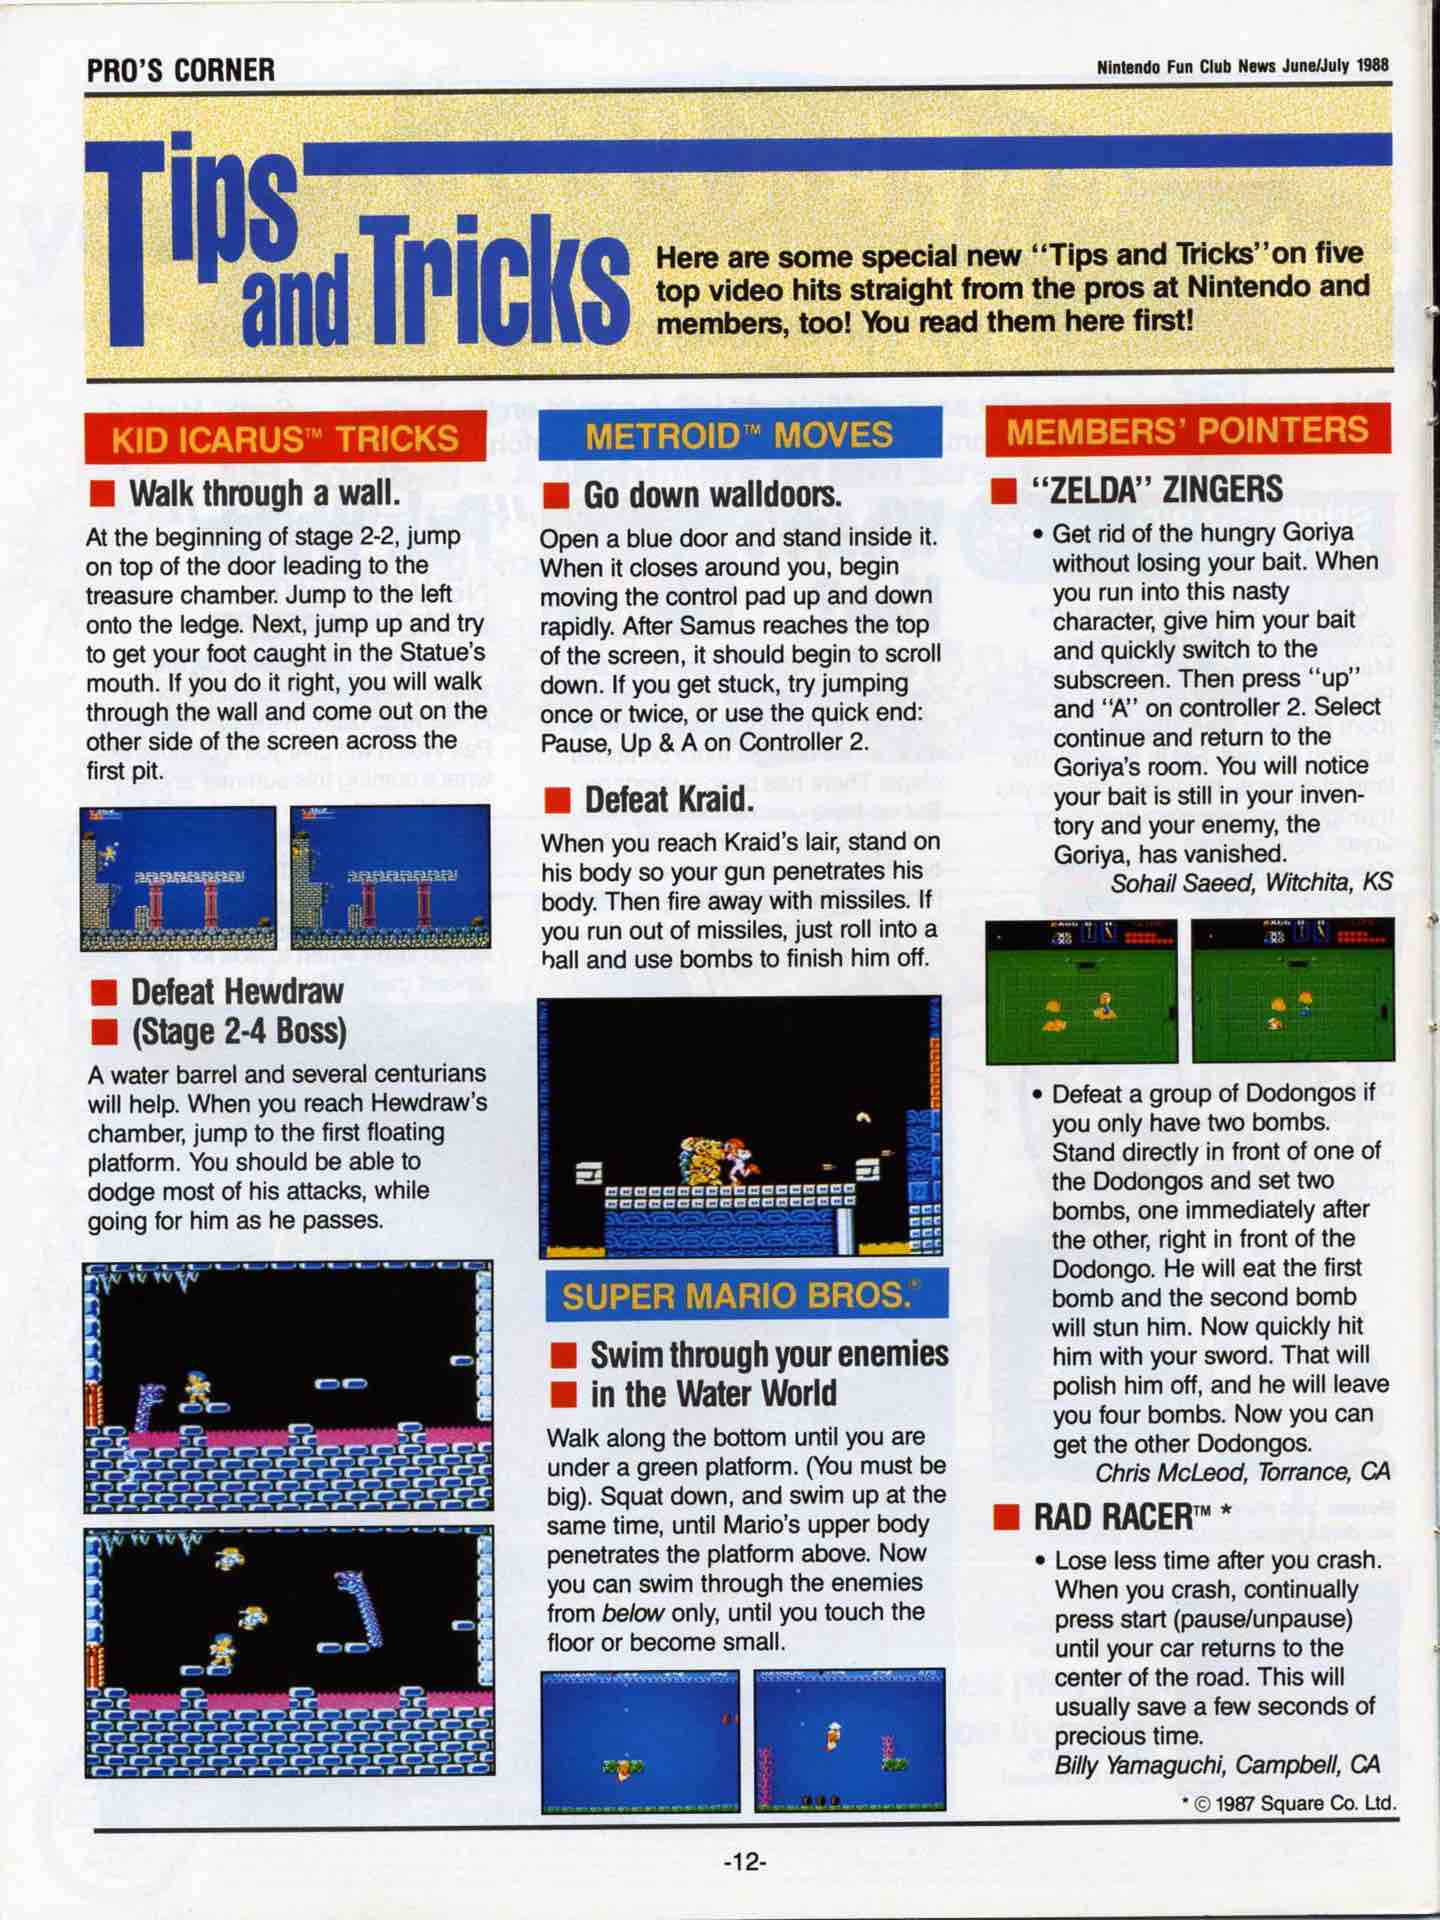 Nintendo Fun Club News | June-July 1988 pg 12